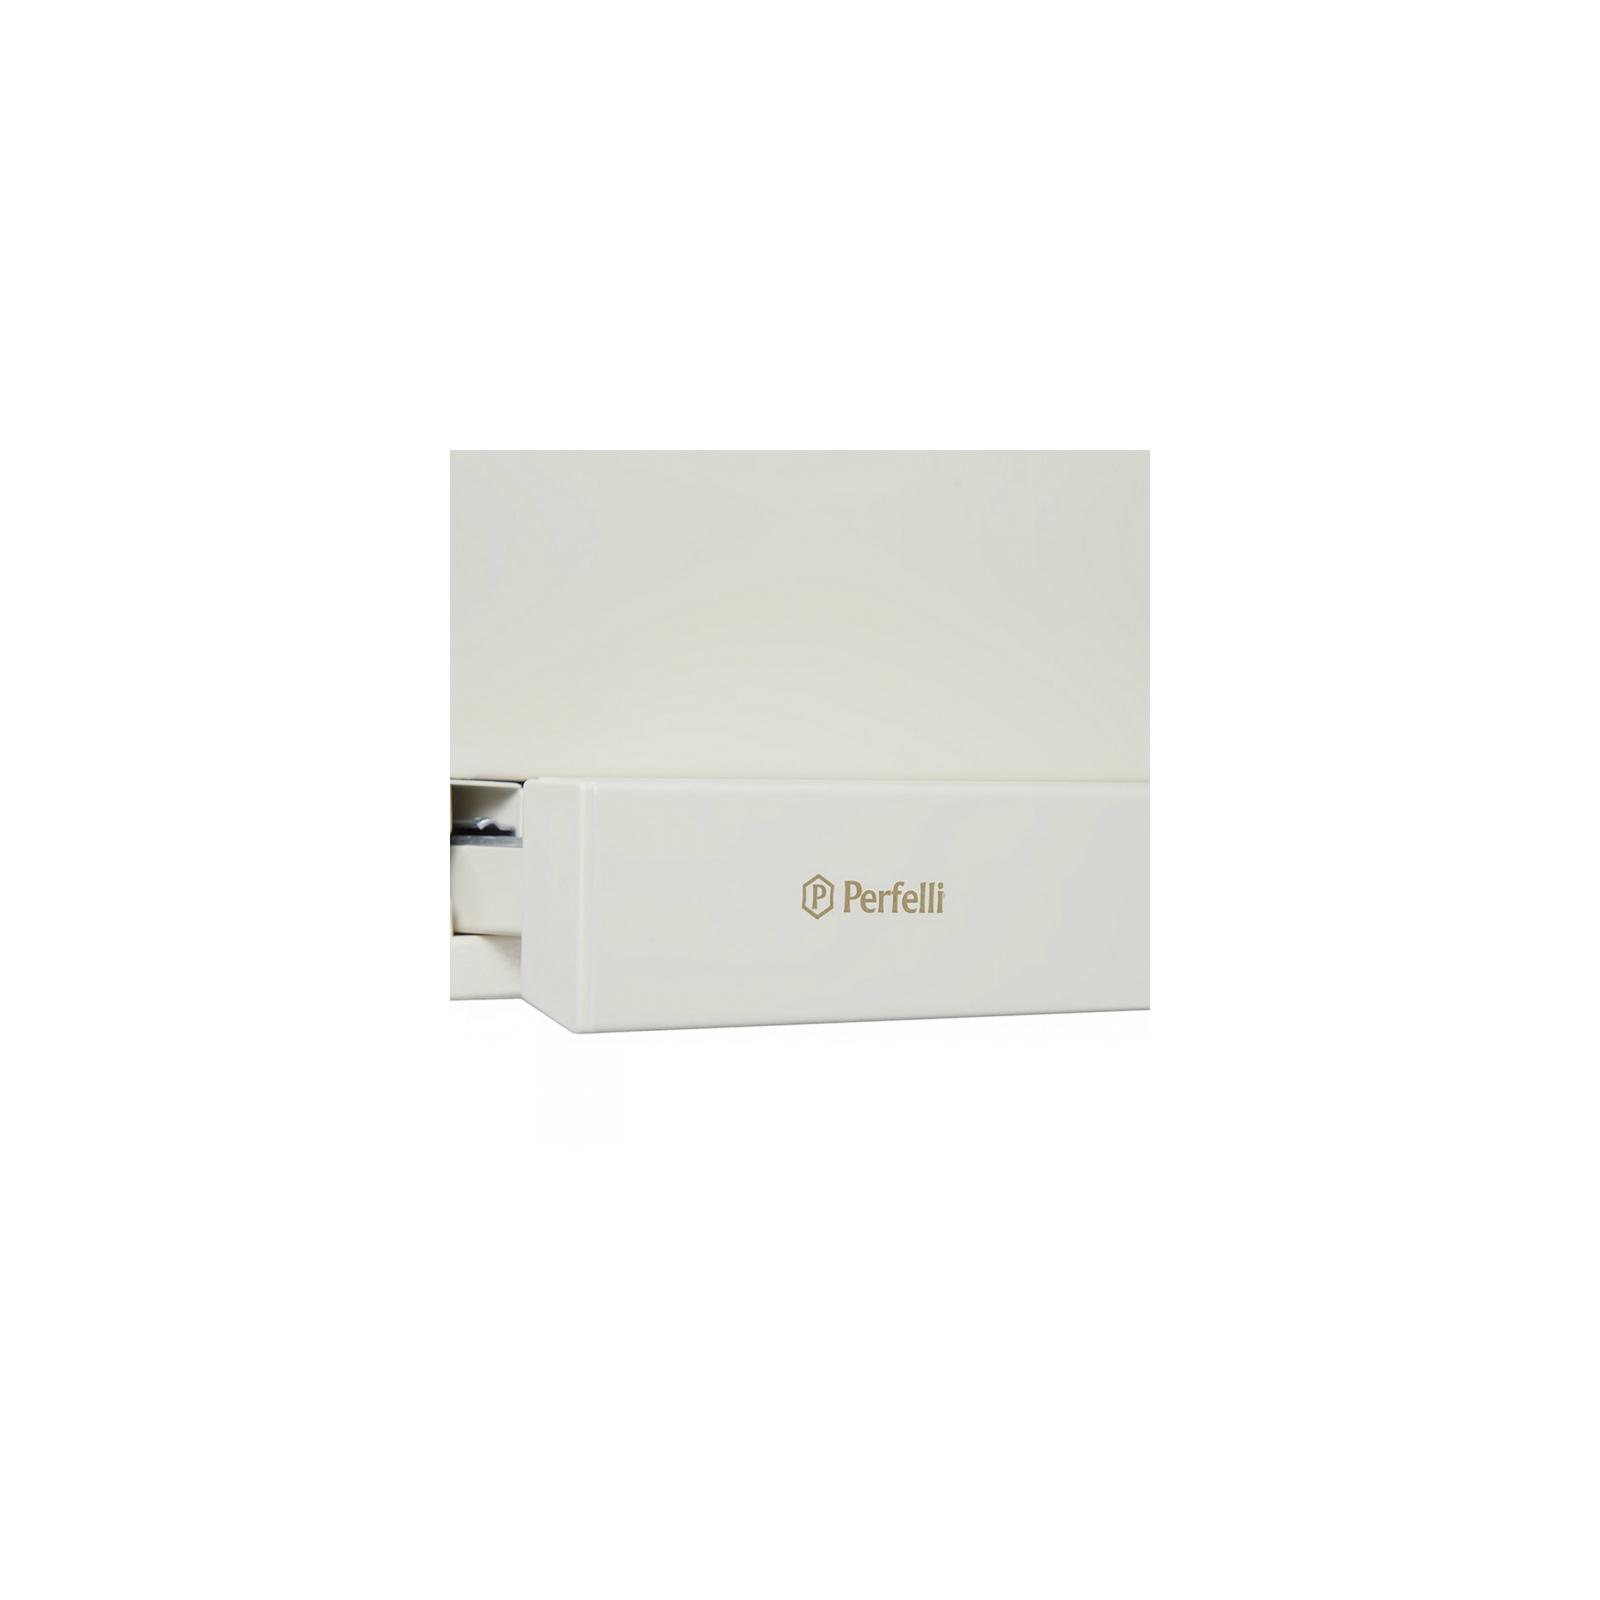 Вытяжка кухонная PERFELLI TL 6612 BL LED изображение 6